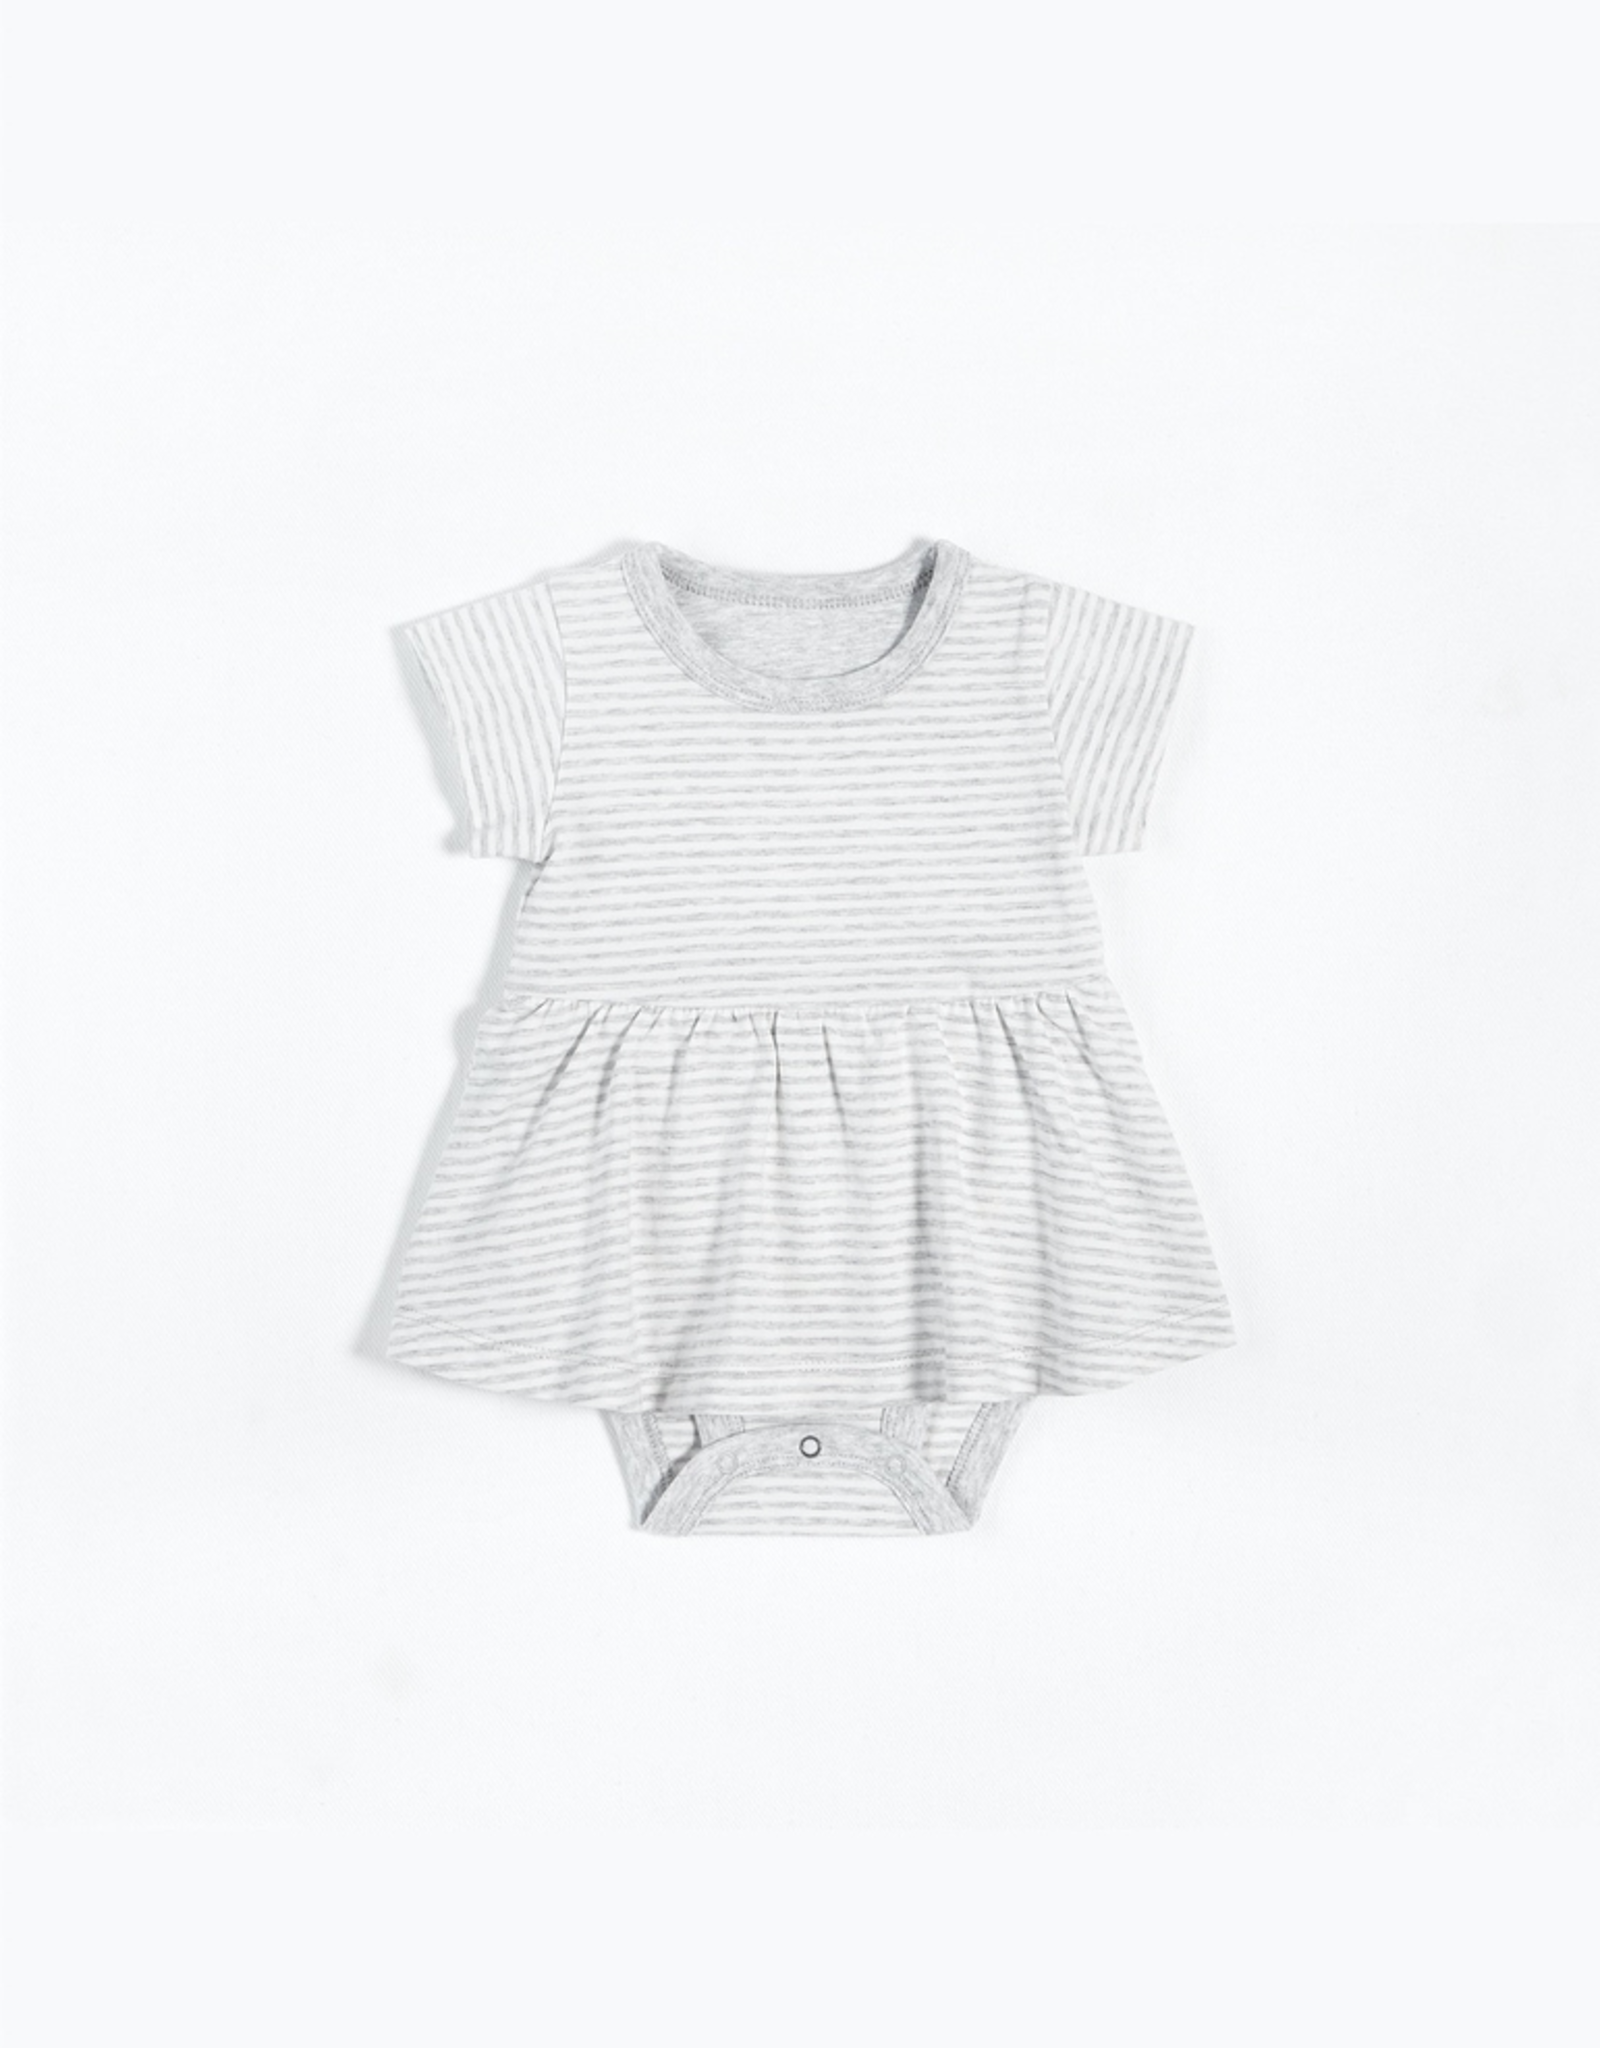 Grey Striped Peplum Onesie with Organic Cotton